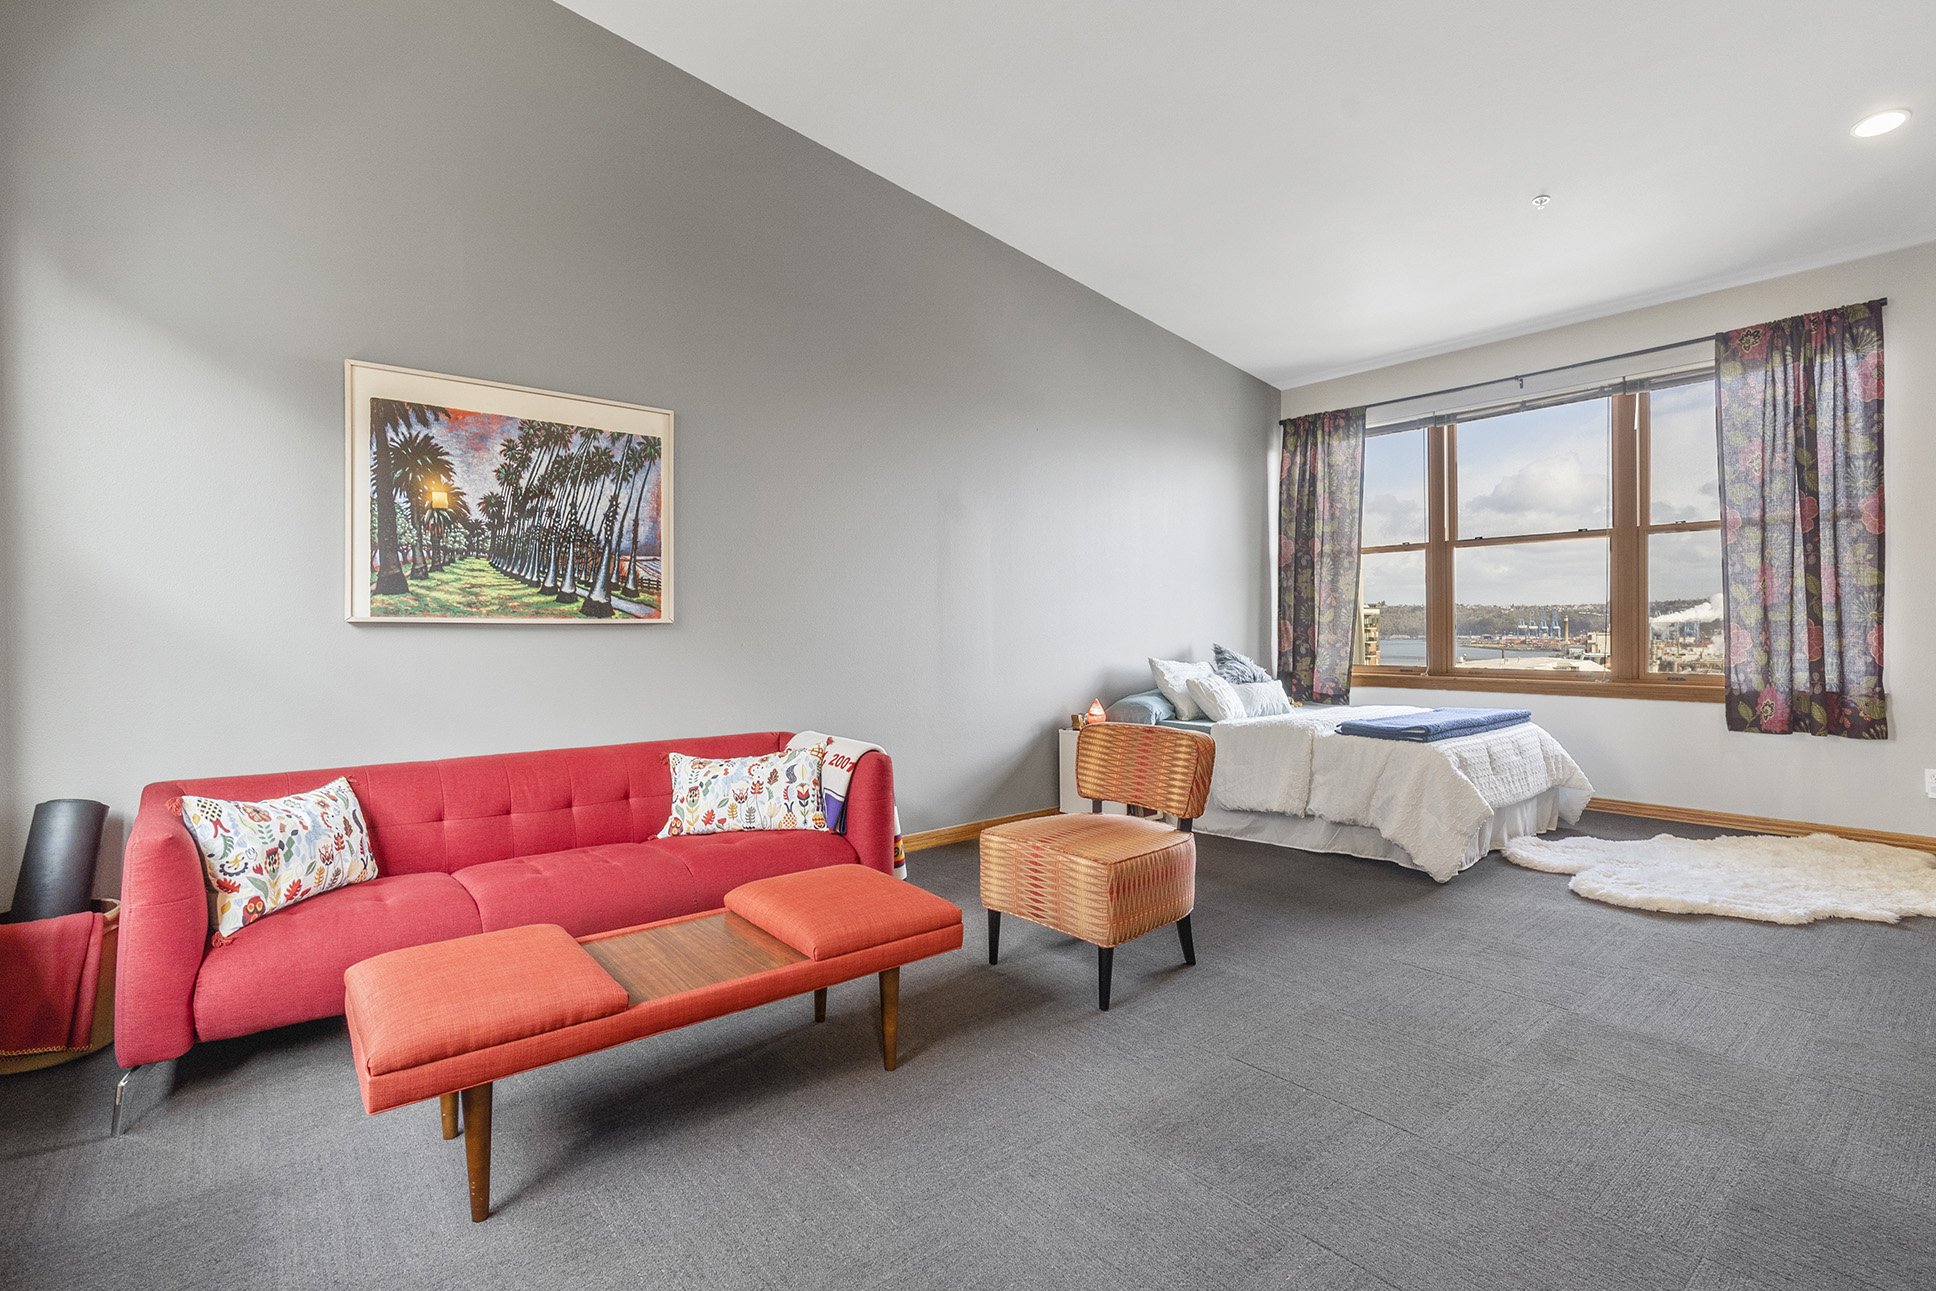 Spacious third floor master bedroom